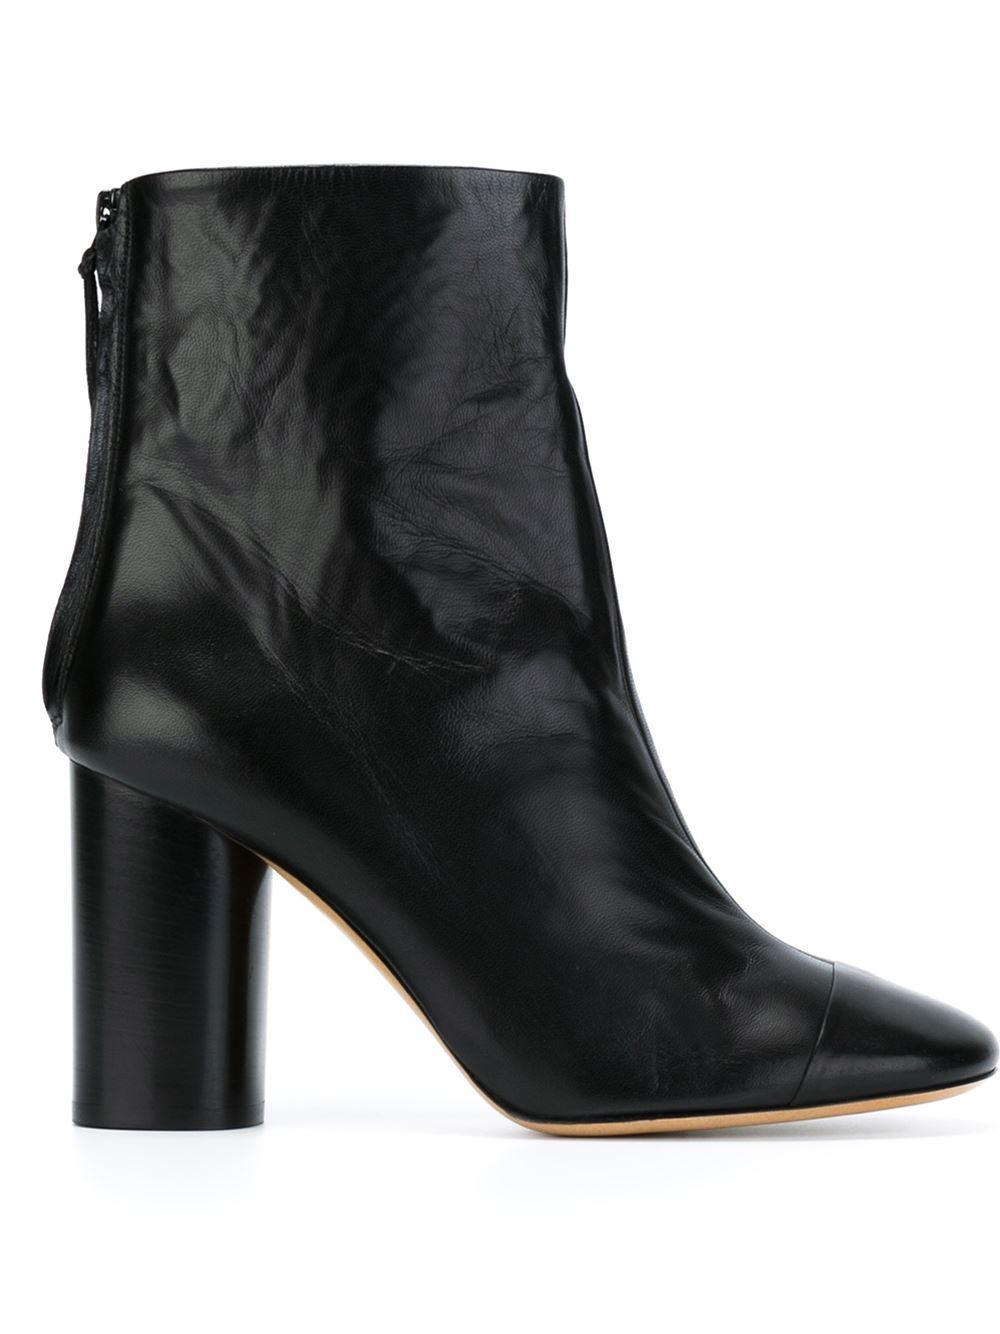 isabel marant 39 grover 39 ankle boots in black lyst. Black Bedroom Furniture Sets. Home Design Ideas